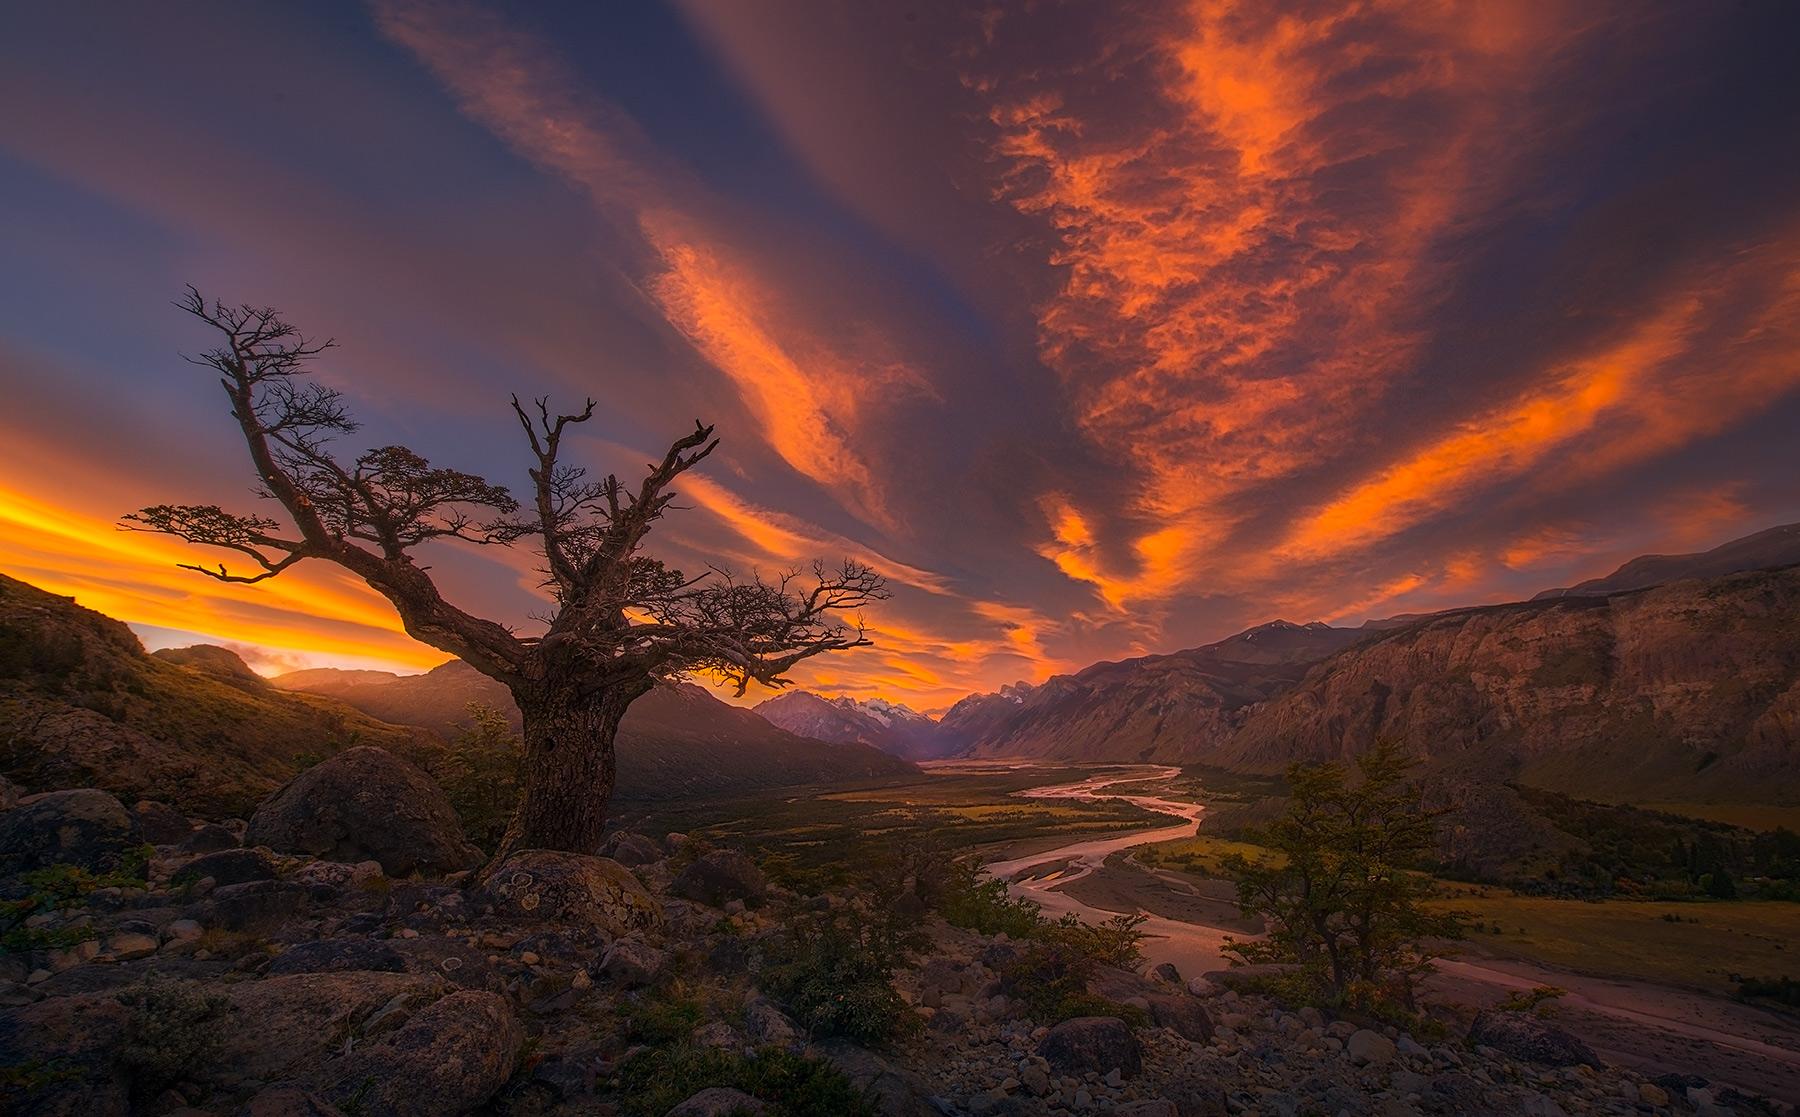 Old tree, Tree, Sunset, River, Vista, Argentina, photo